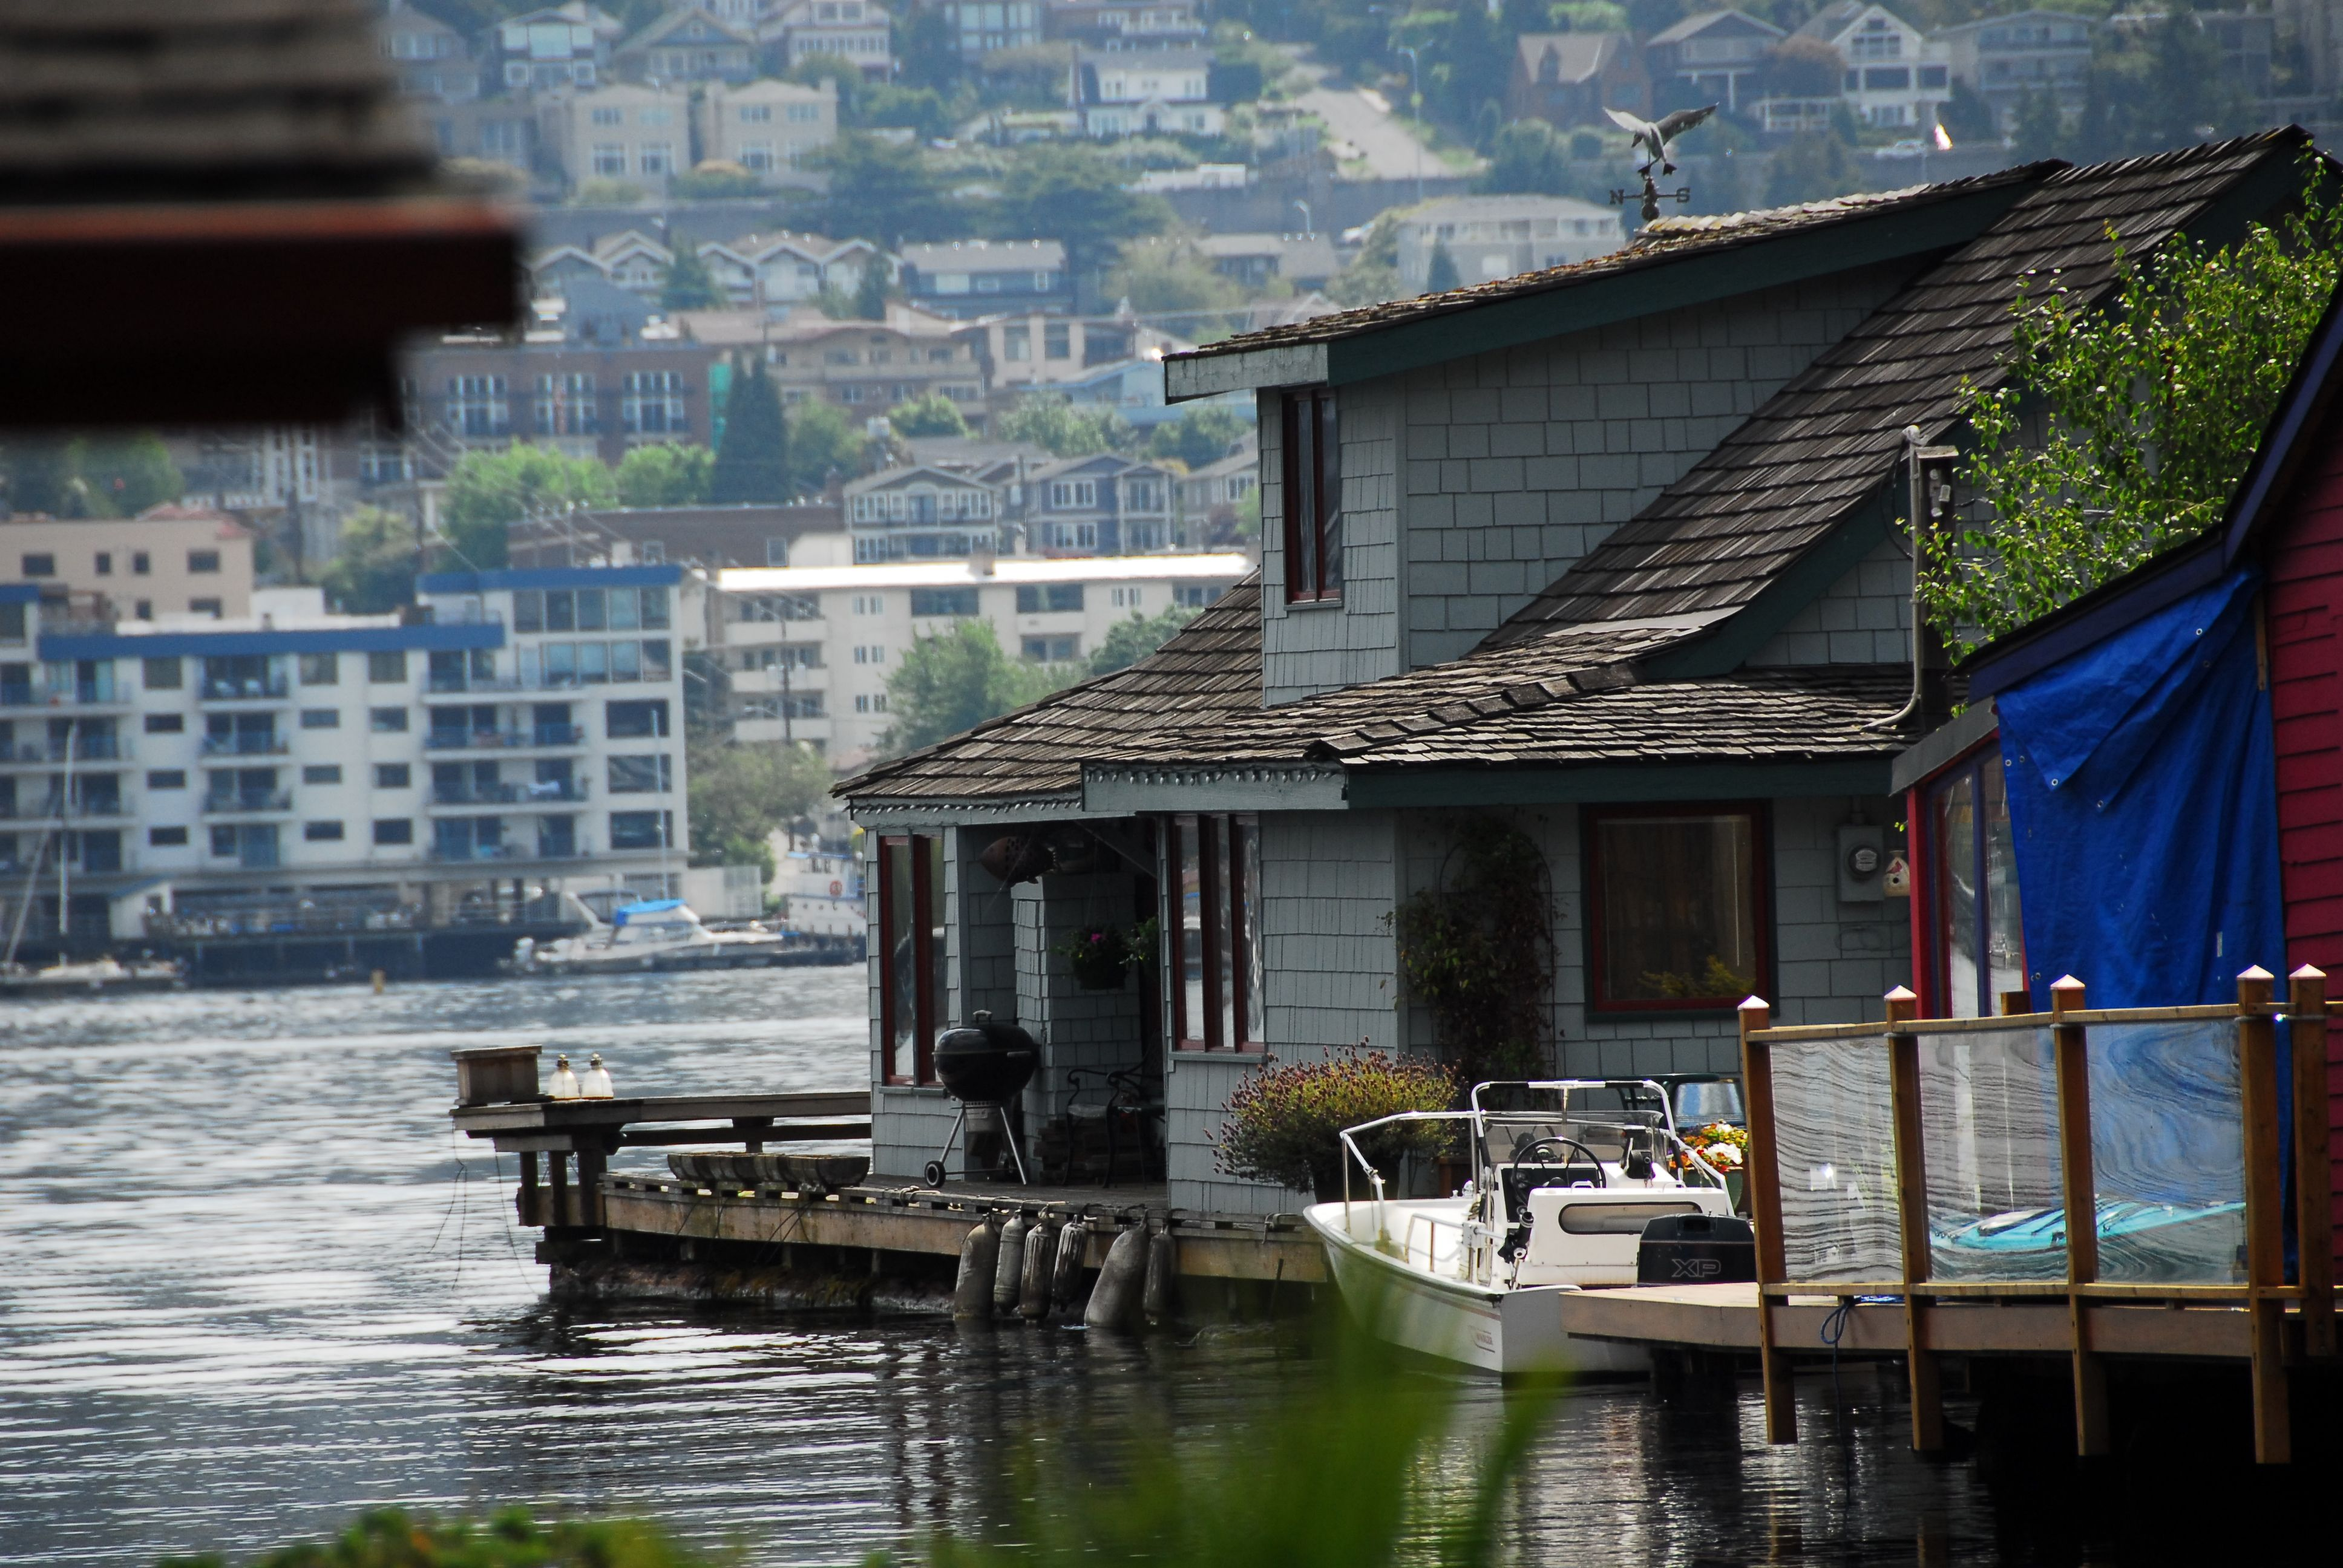 sleepless in seattle boathouse 2460 westlake avenue north lake